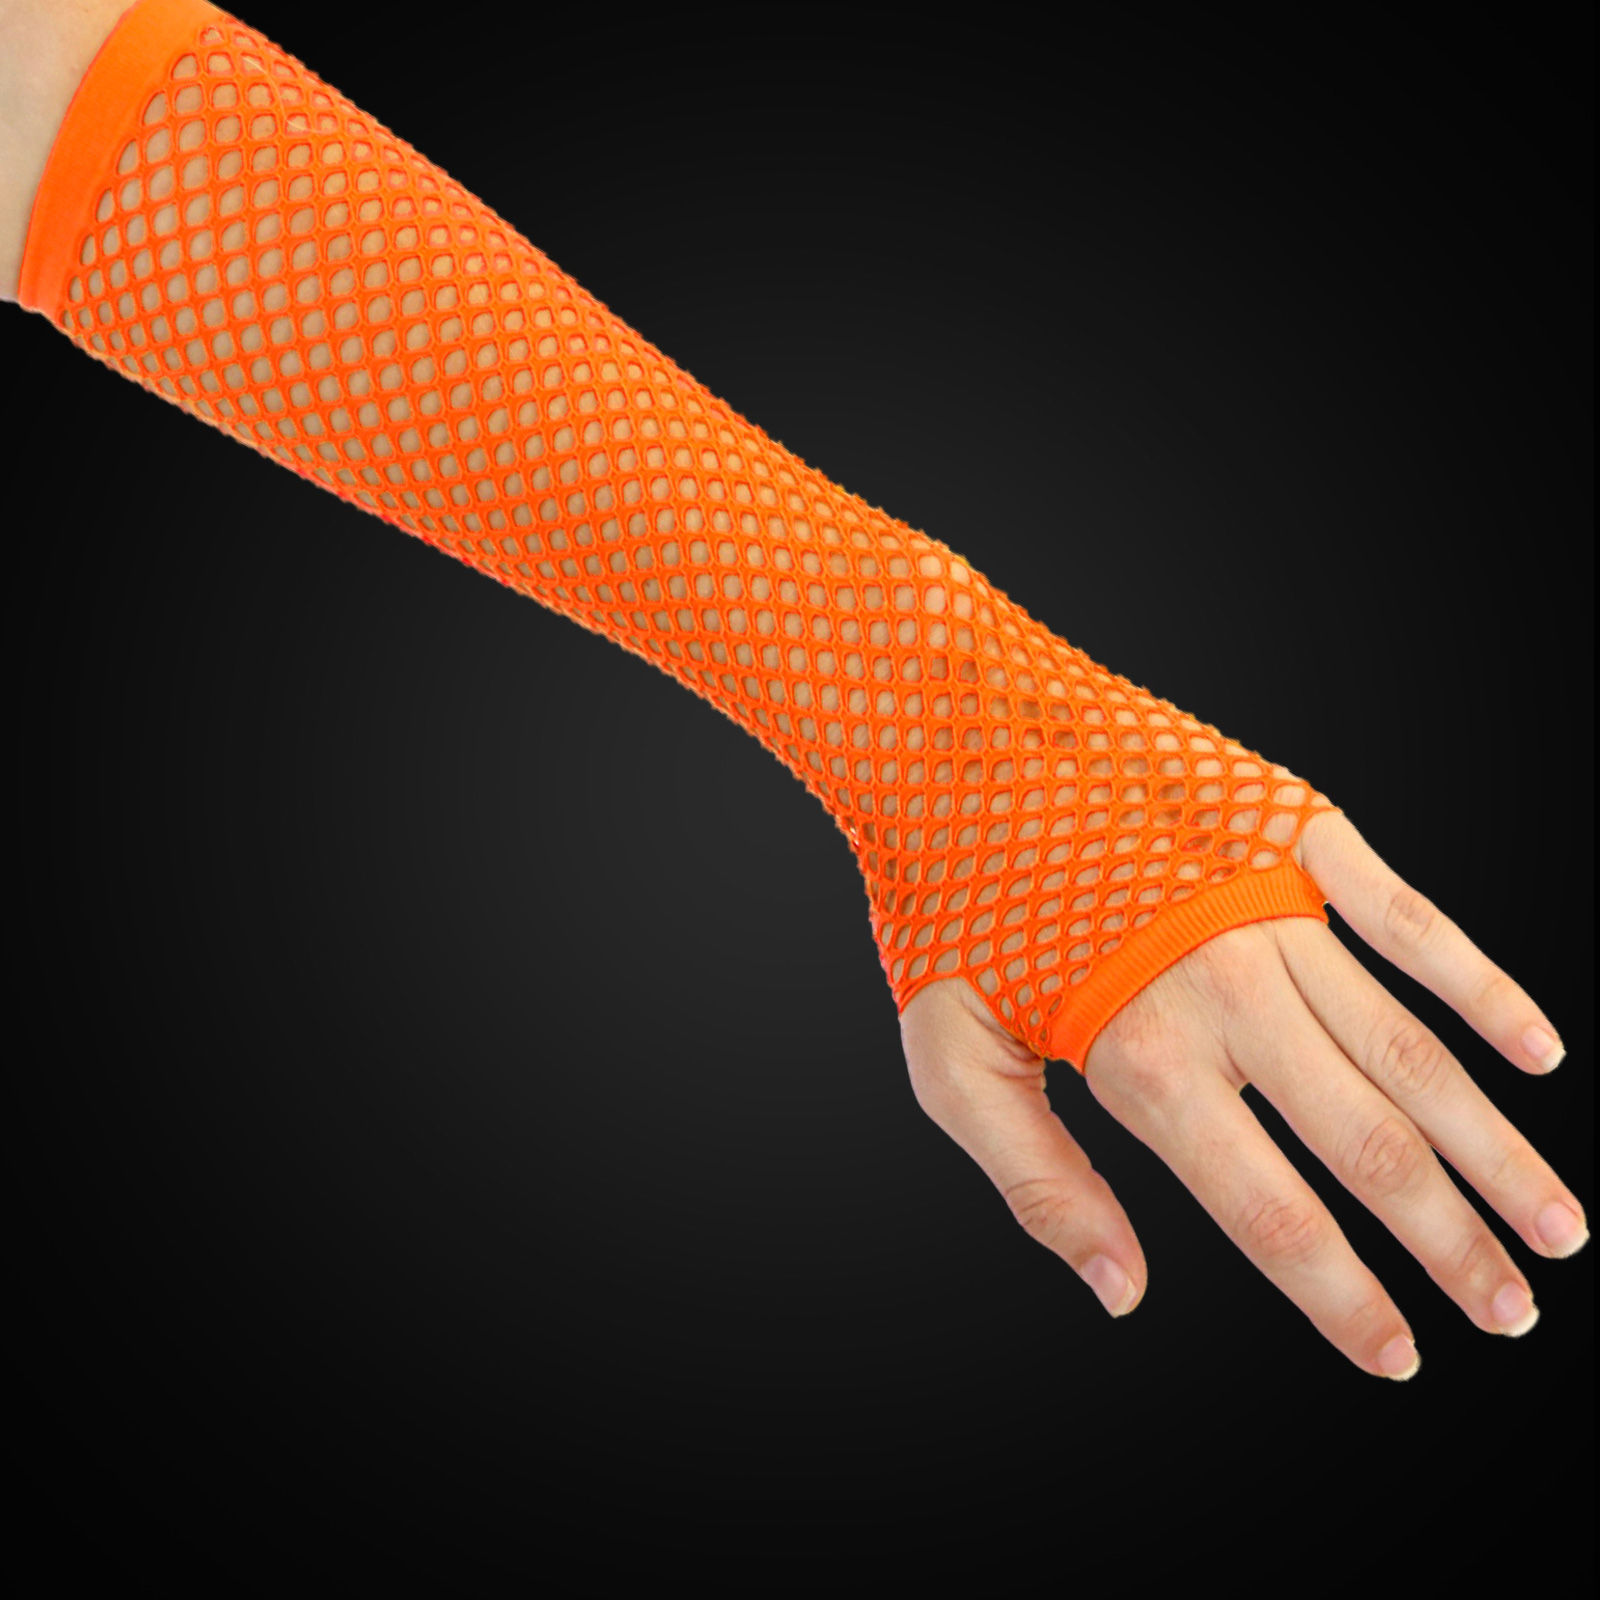 Neon Orange Fishnet Gloves